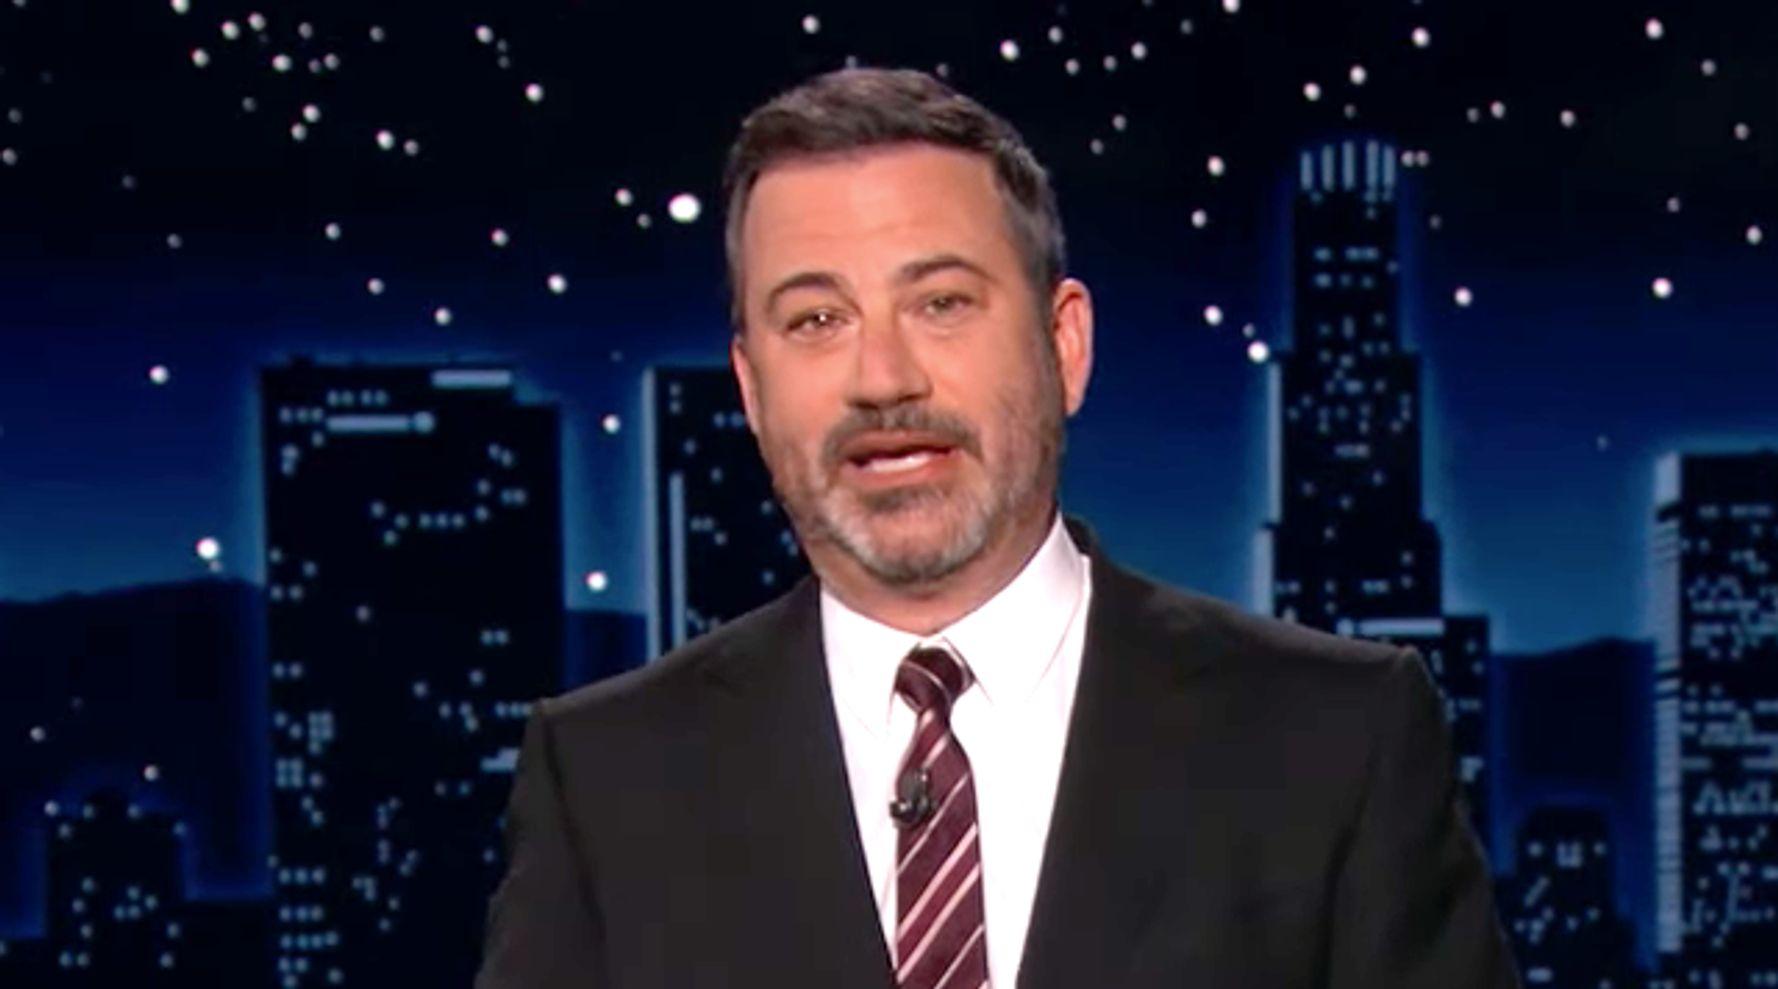 Jimmy Kimmel Mocks Rep. Matt Gaetz's 'Not Suspicious' Pardon Request